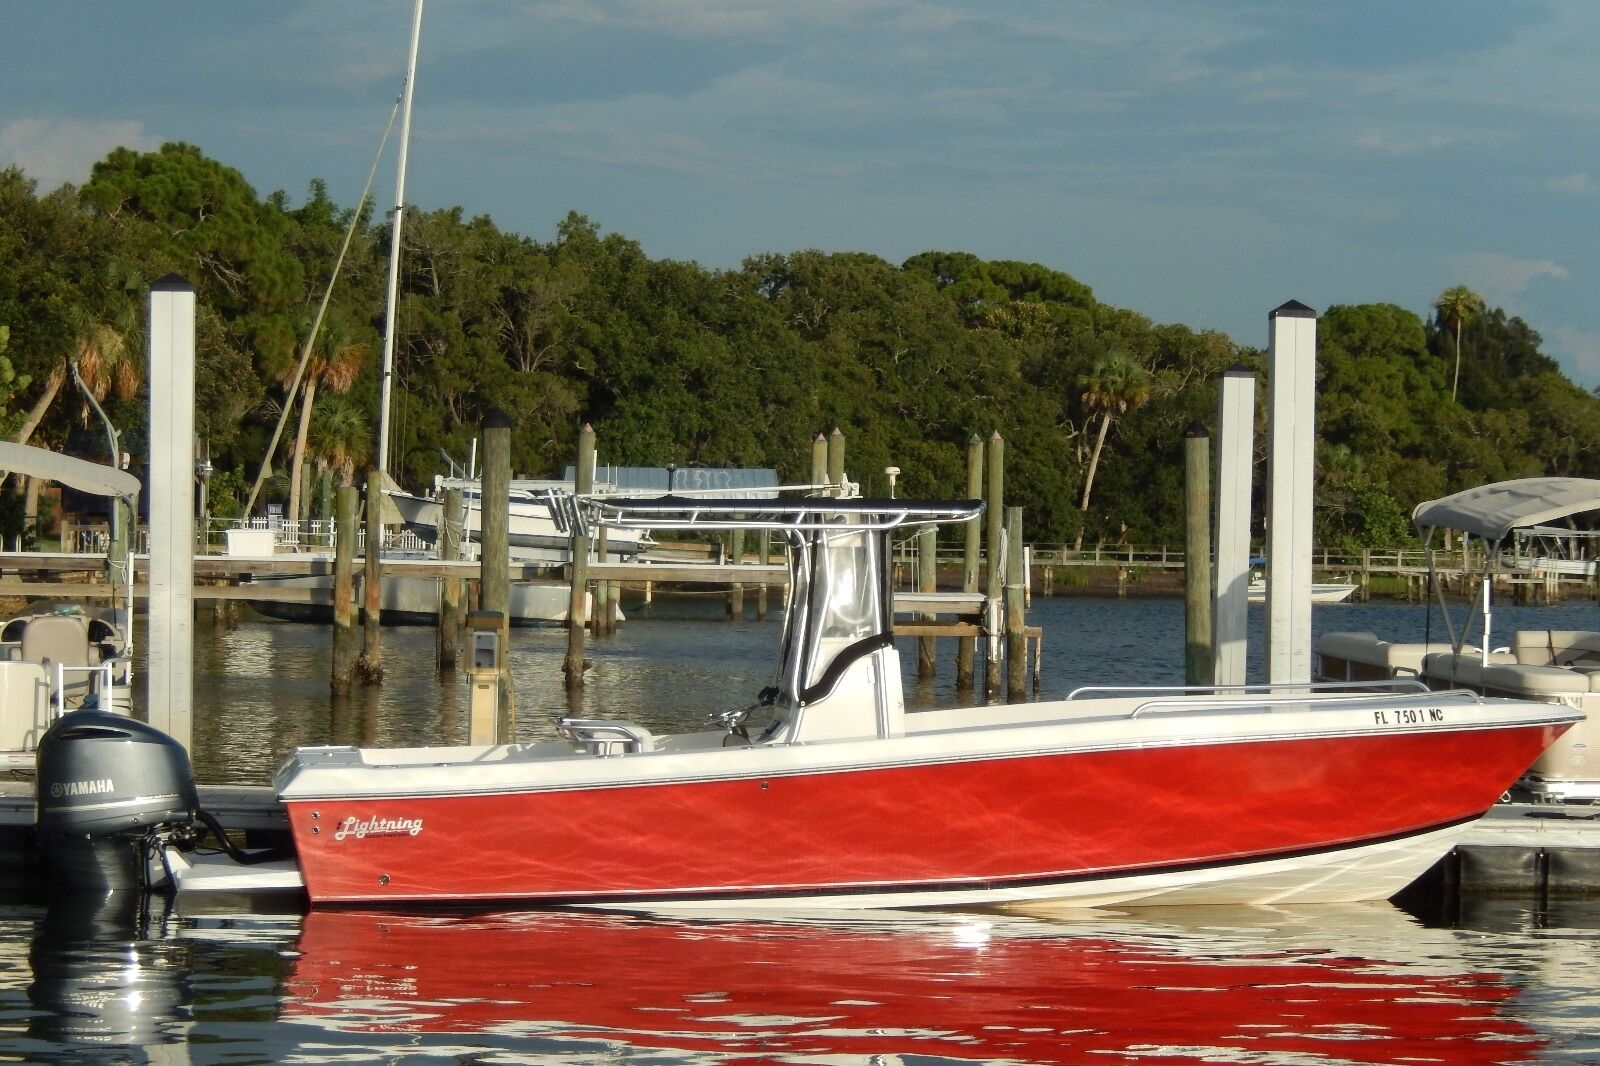 2006 26 Ft Center Console Fishing Boat W/ 2013 Yamaha 300 4-Stroke